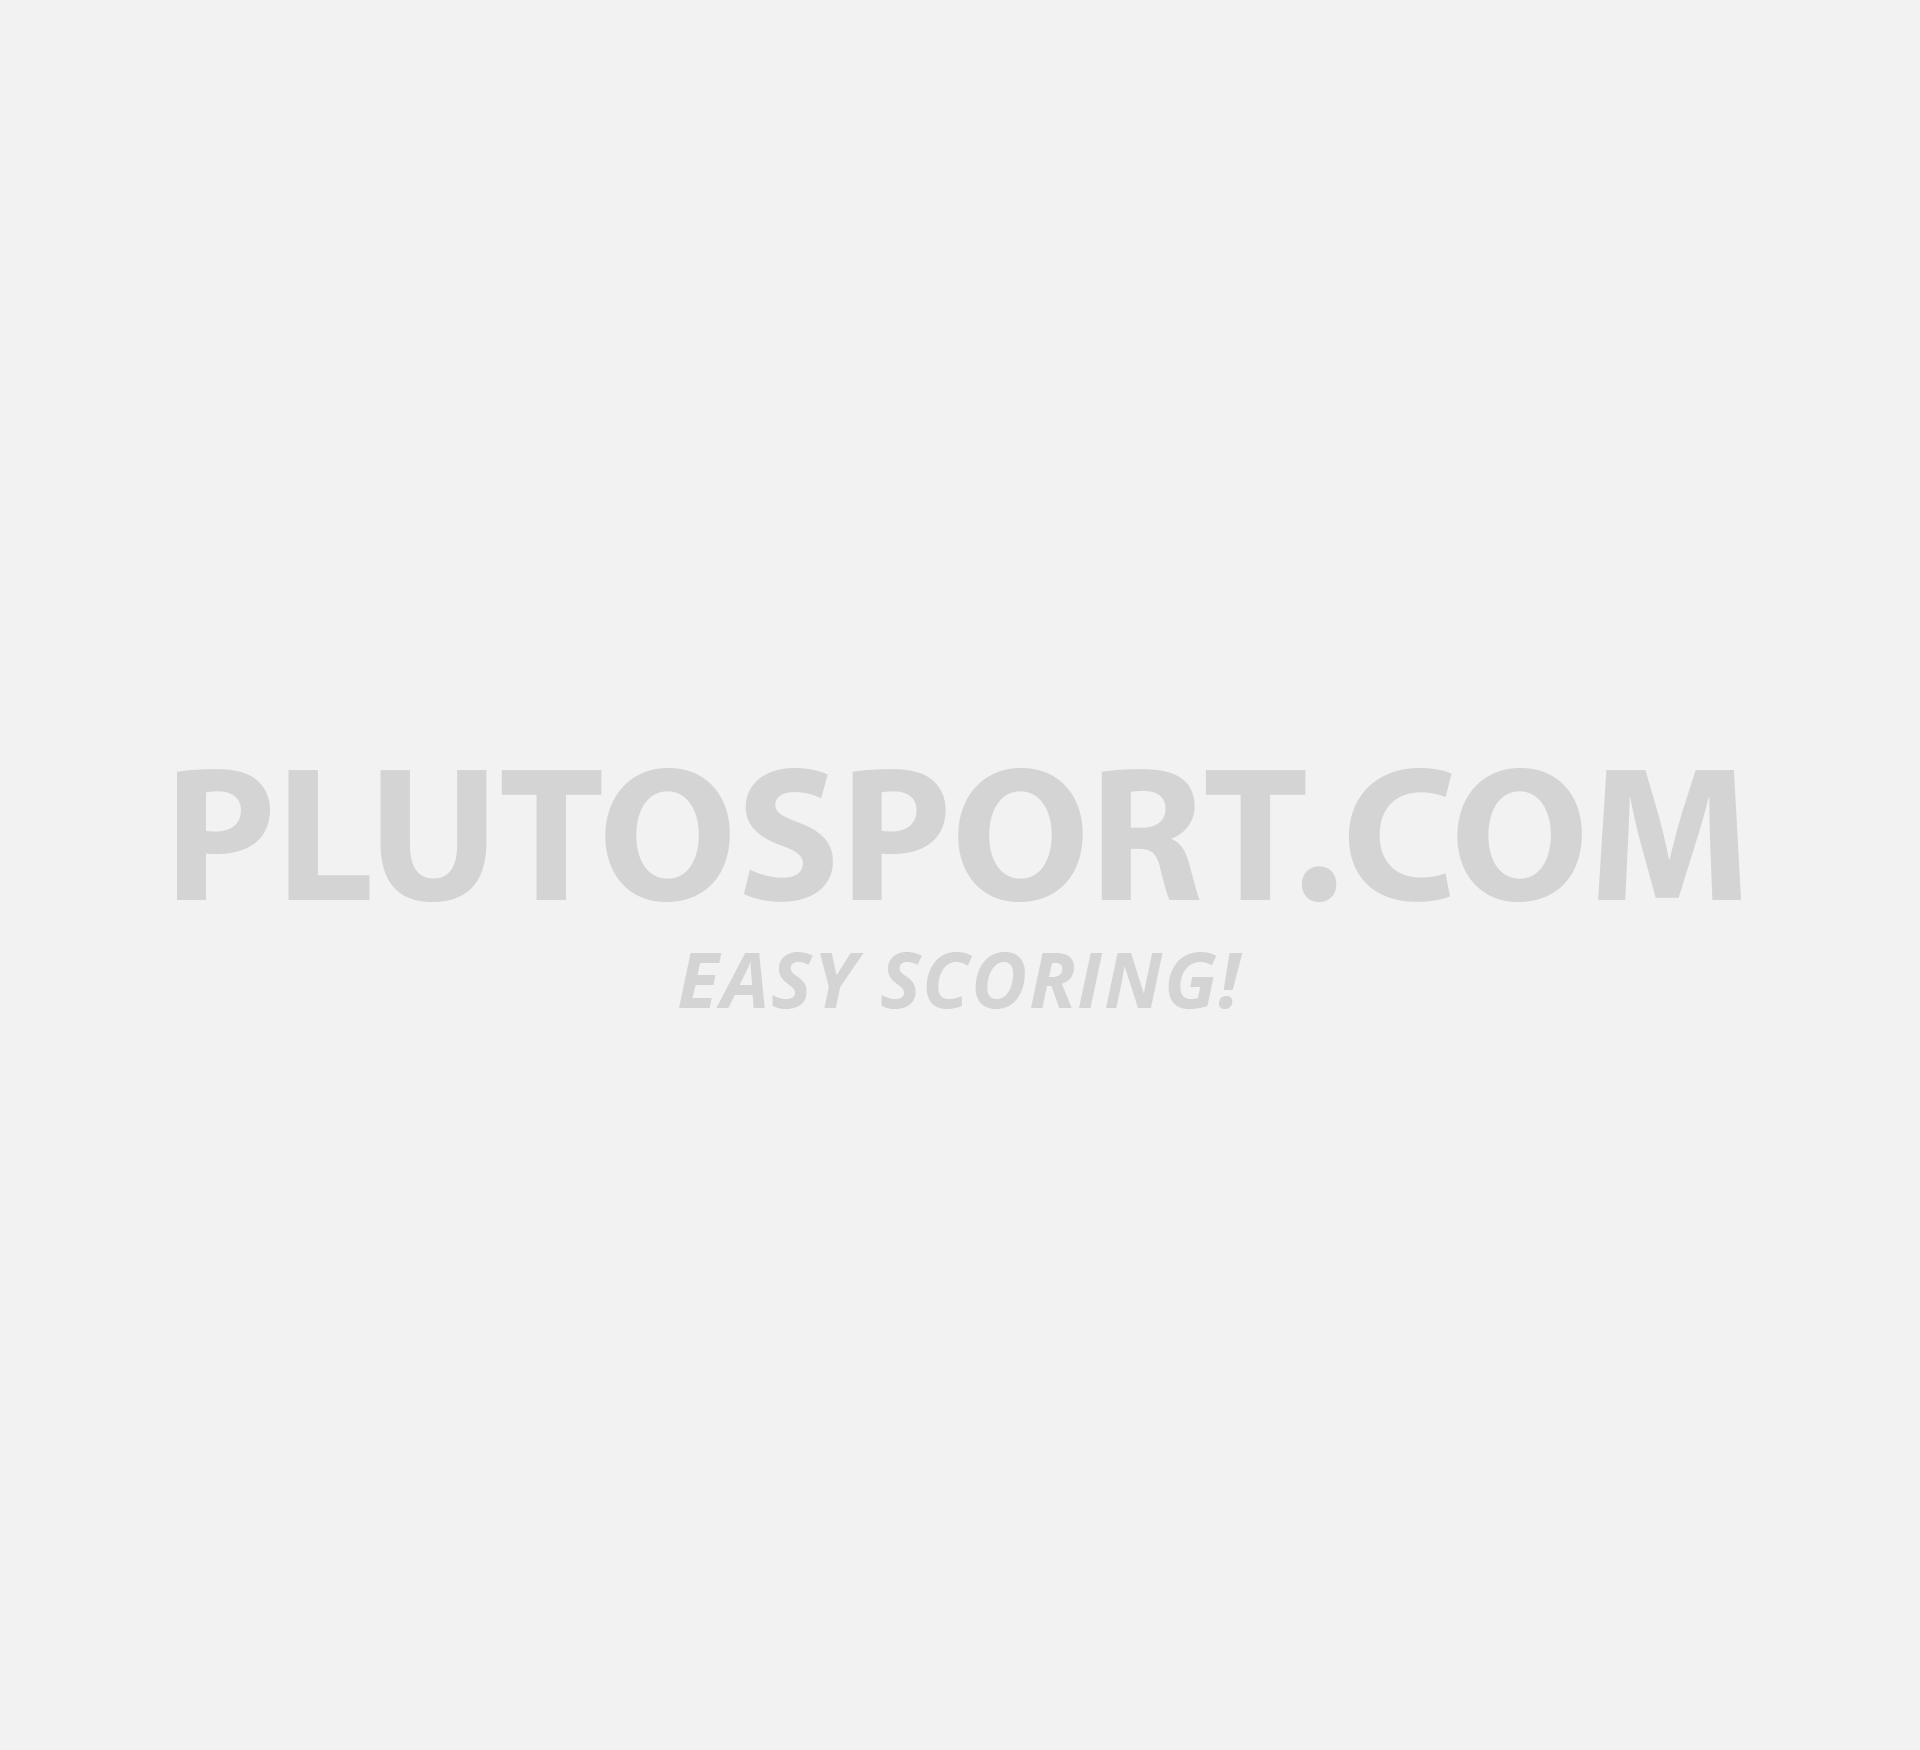 24a7a2be2f2 Puma Capitano II FG - Boots fixed stud - Shoes - Football - Sports ...